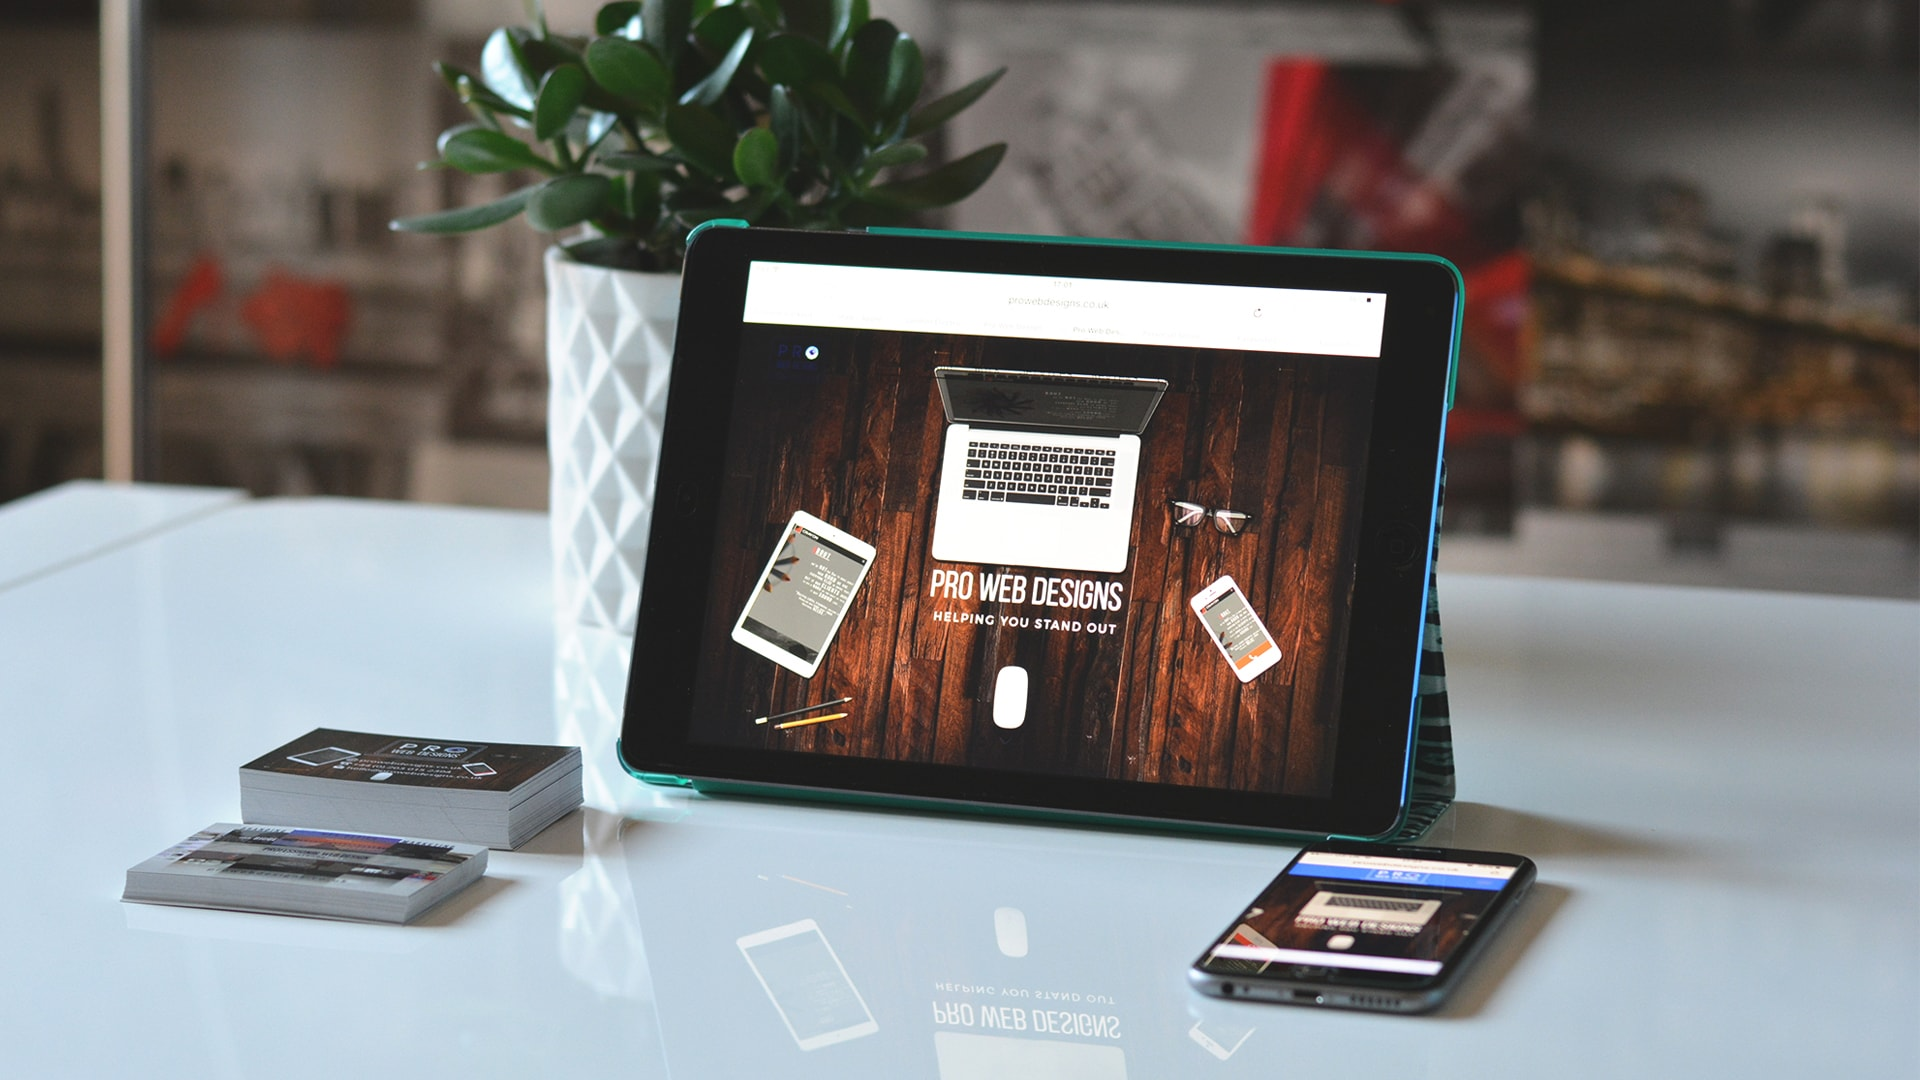 Pro Web Designs | Professional Web Design | Development